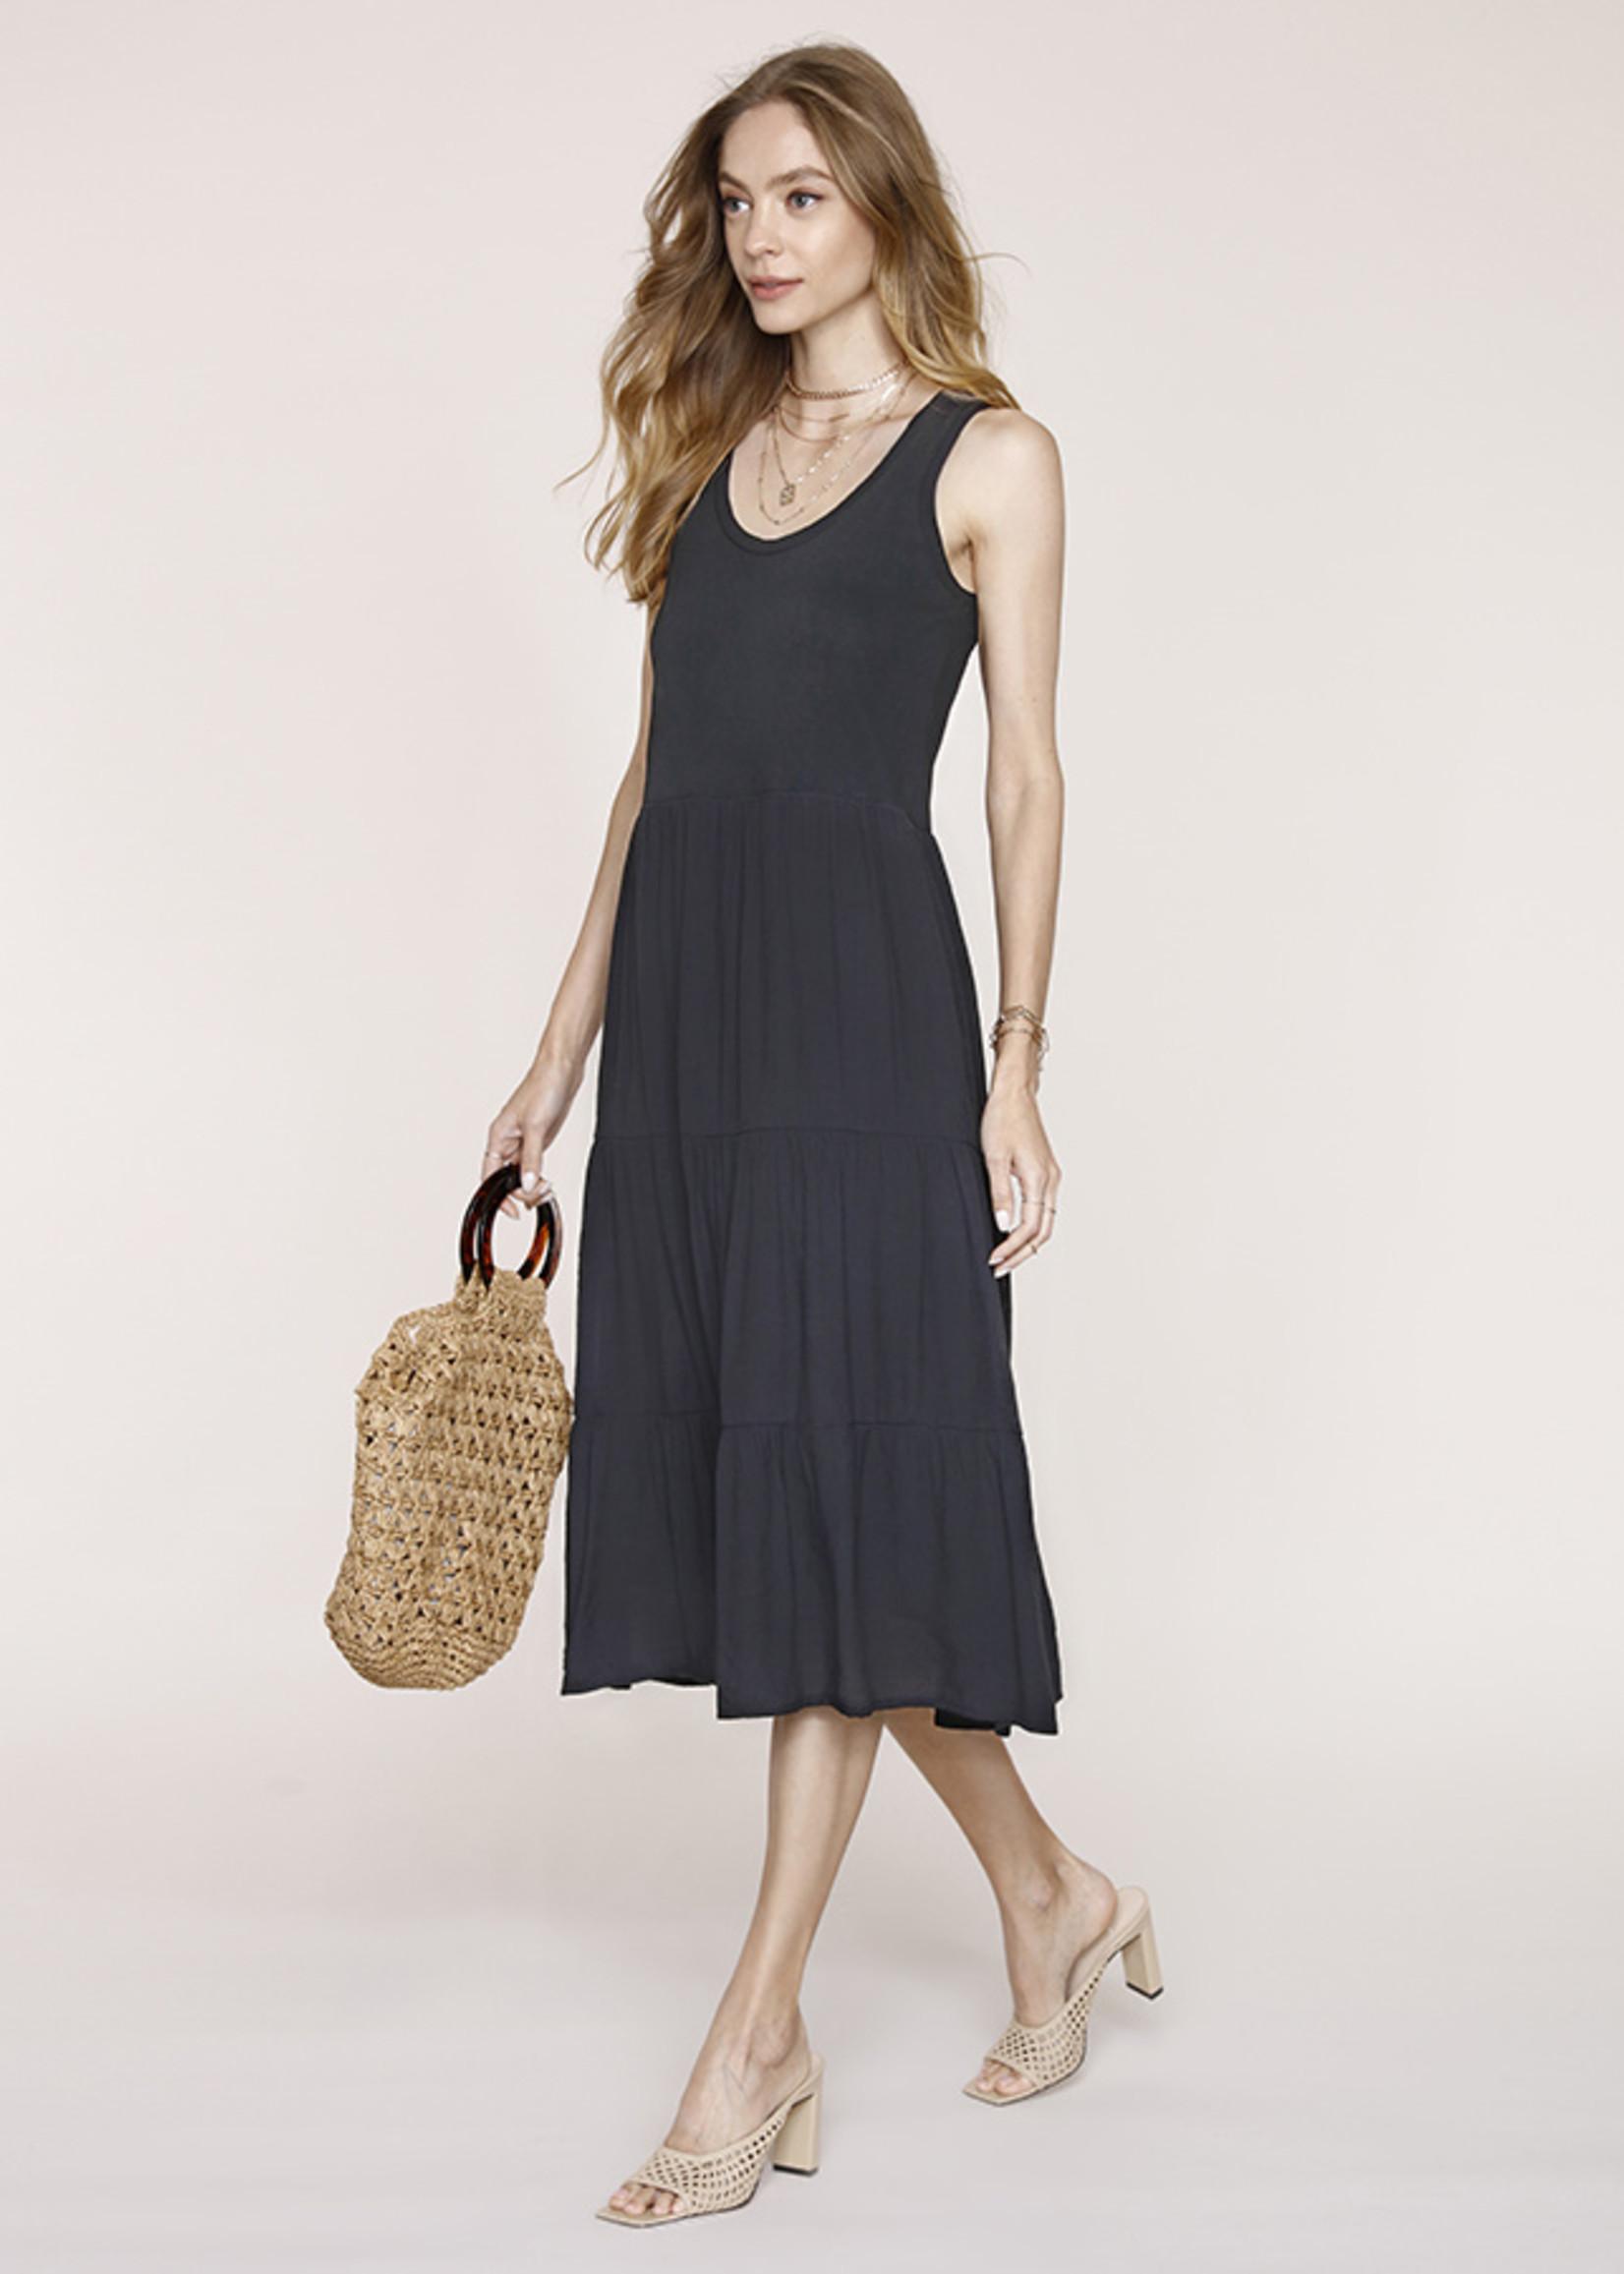 Elitaire Boutique Pryce Dress in Black